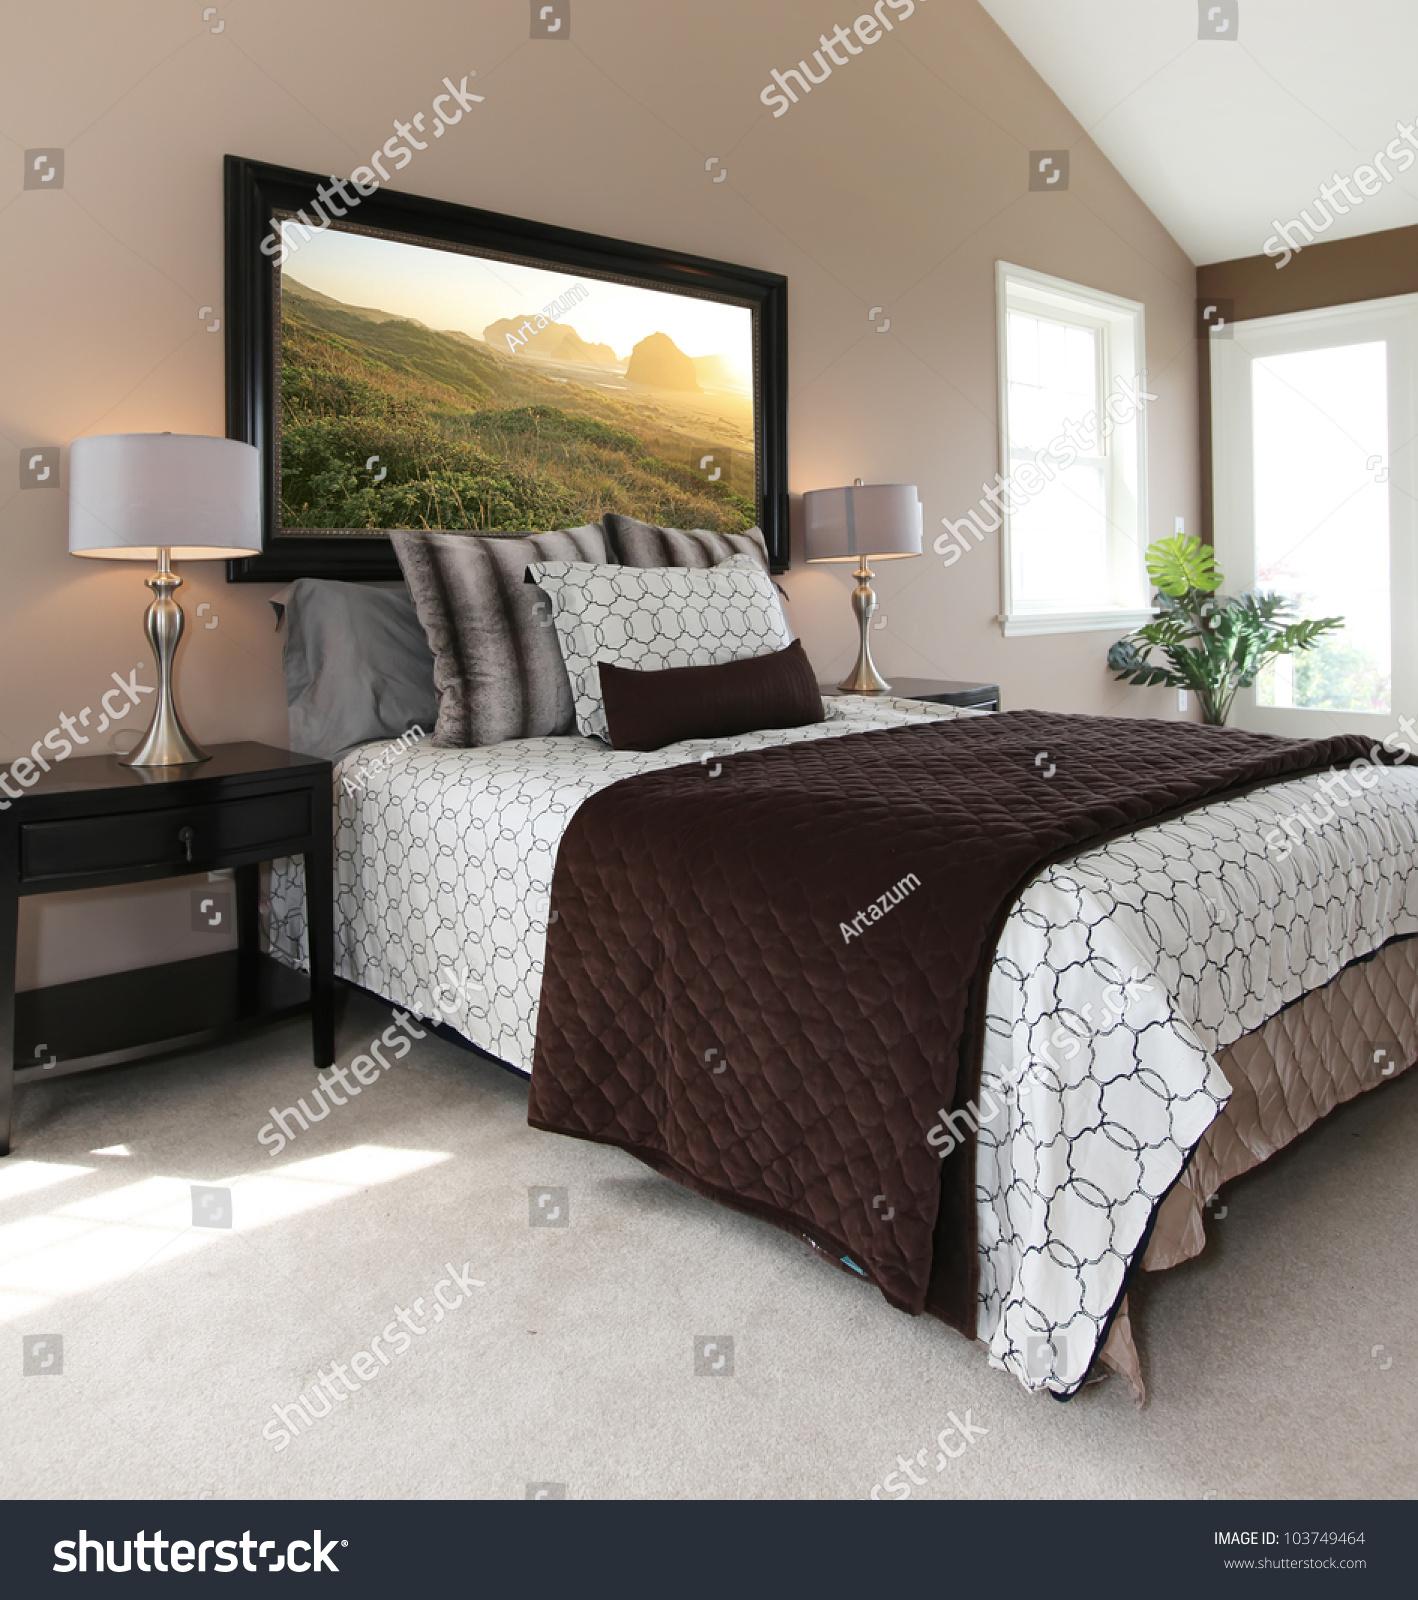 bedroom modern white brown bed nightstands stock photo